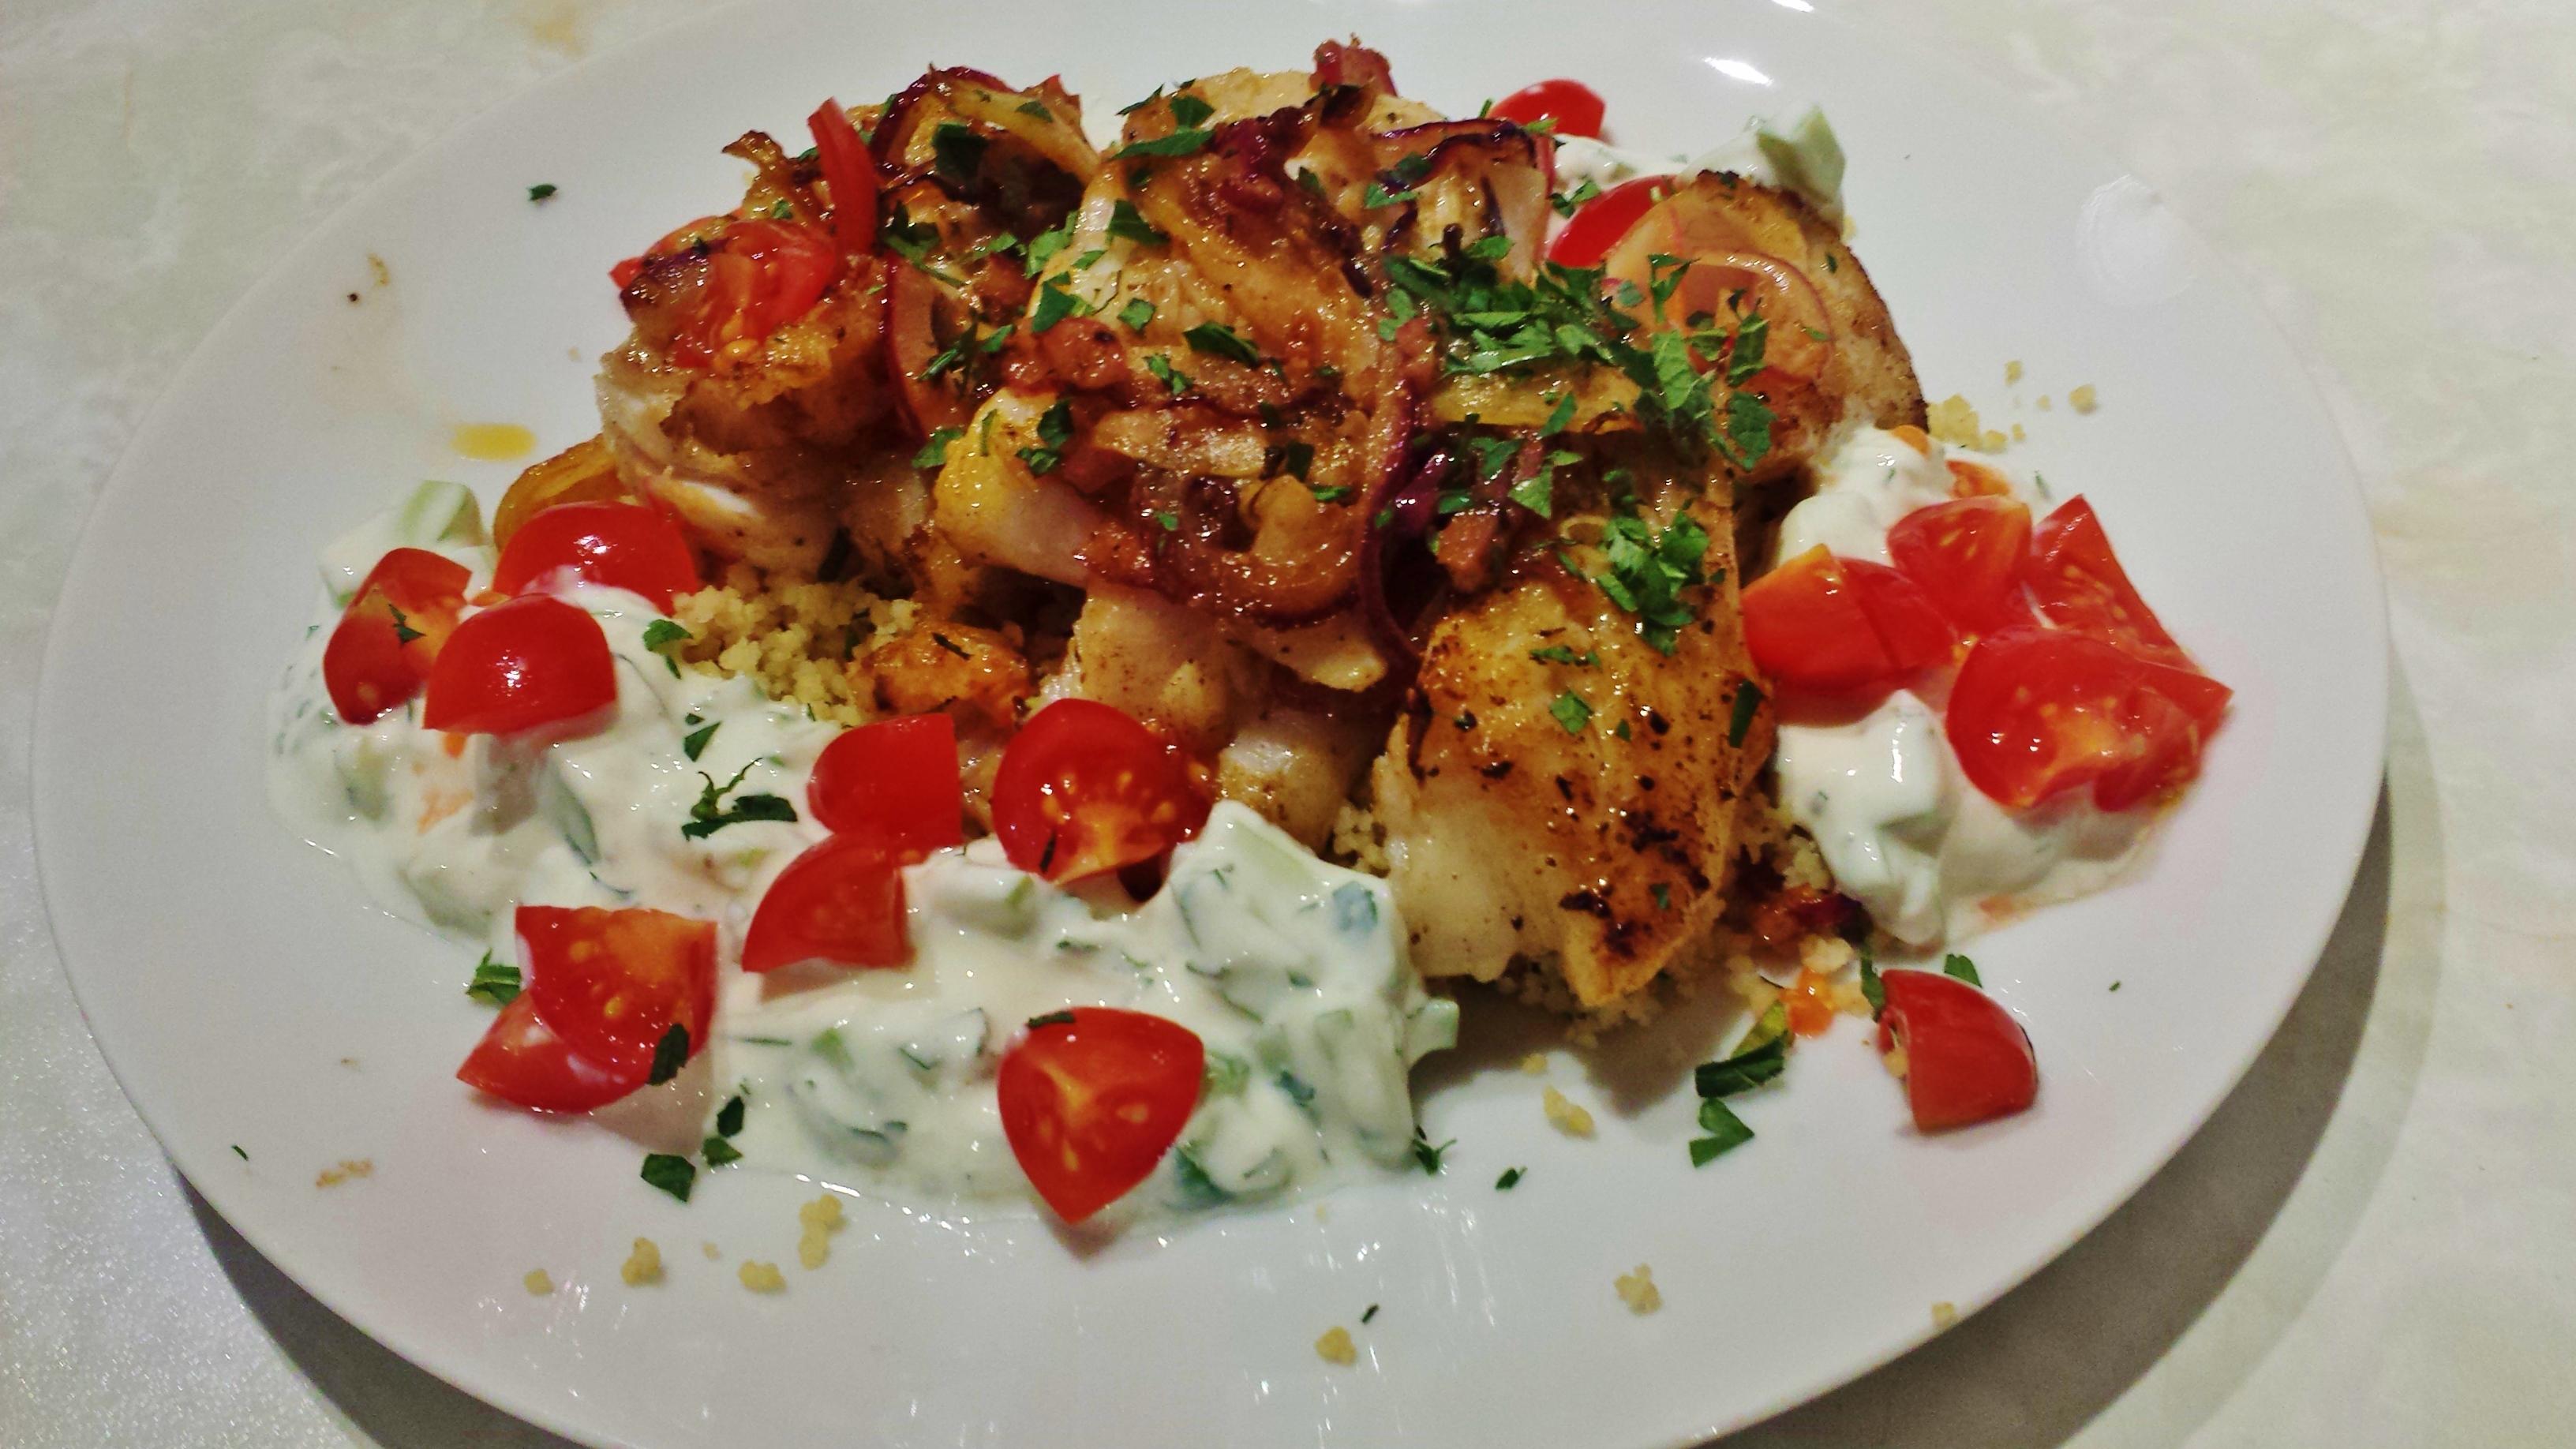 Turkish Spiced Hake with Yogurt Sauce